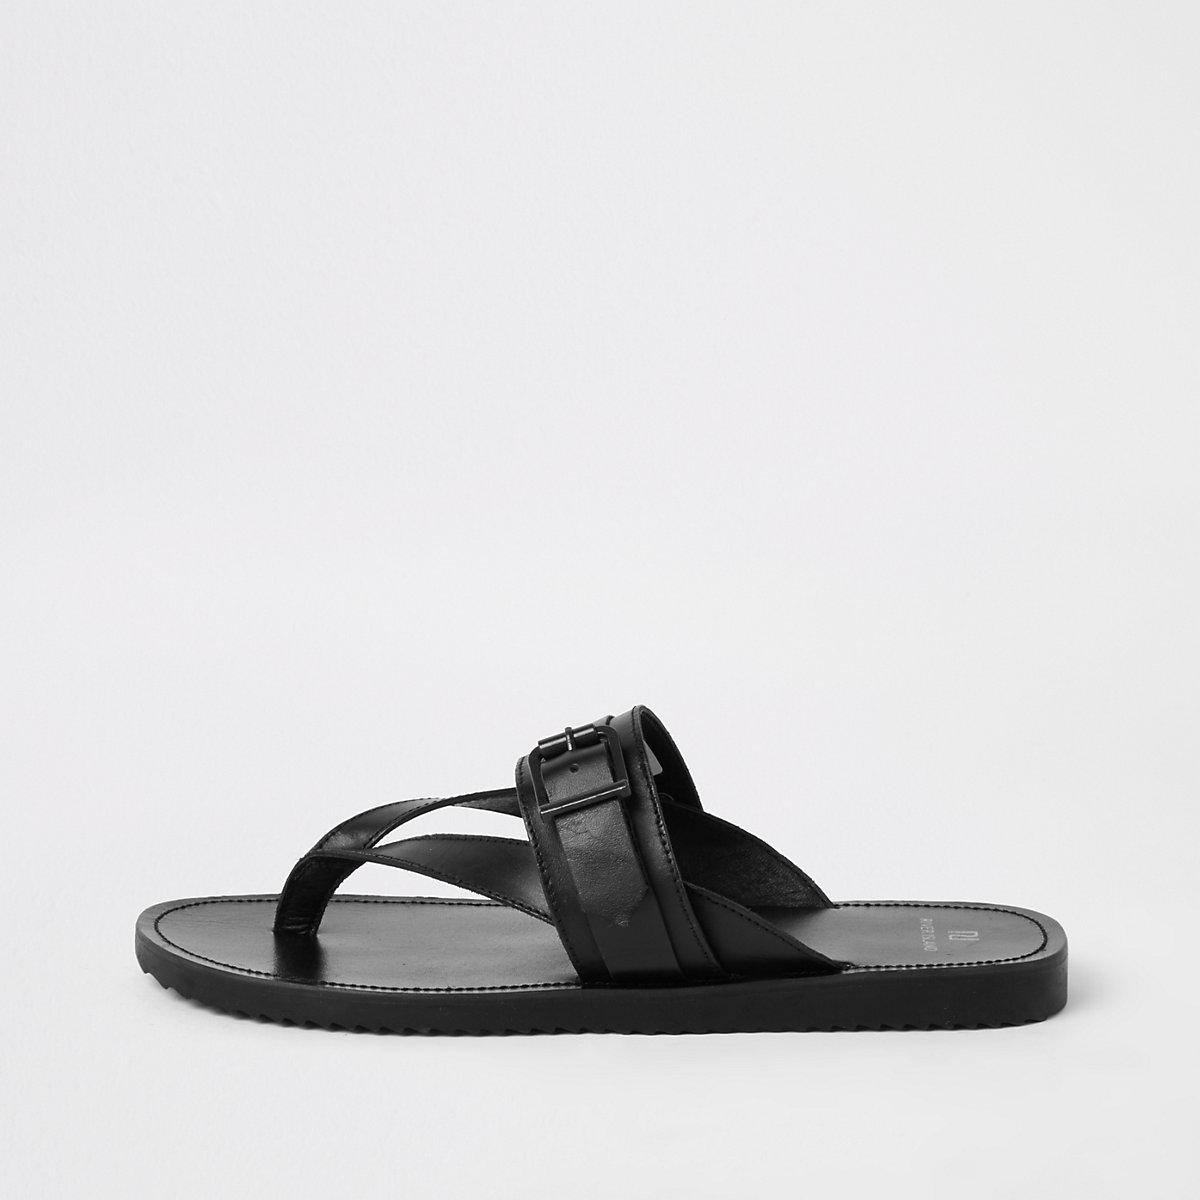 Black leather buckle flip flops